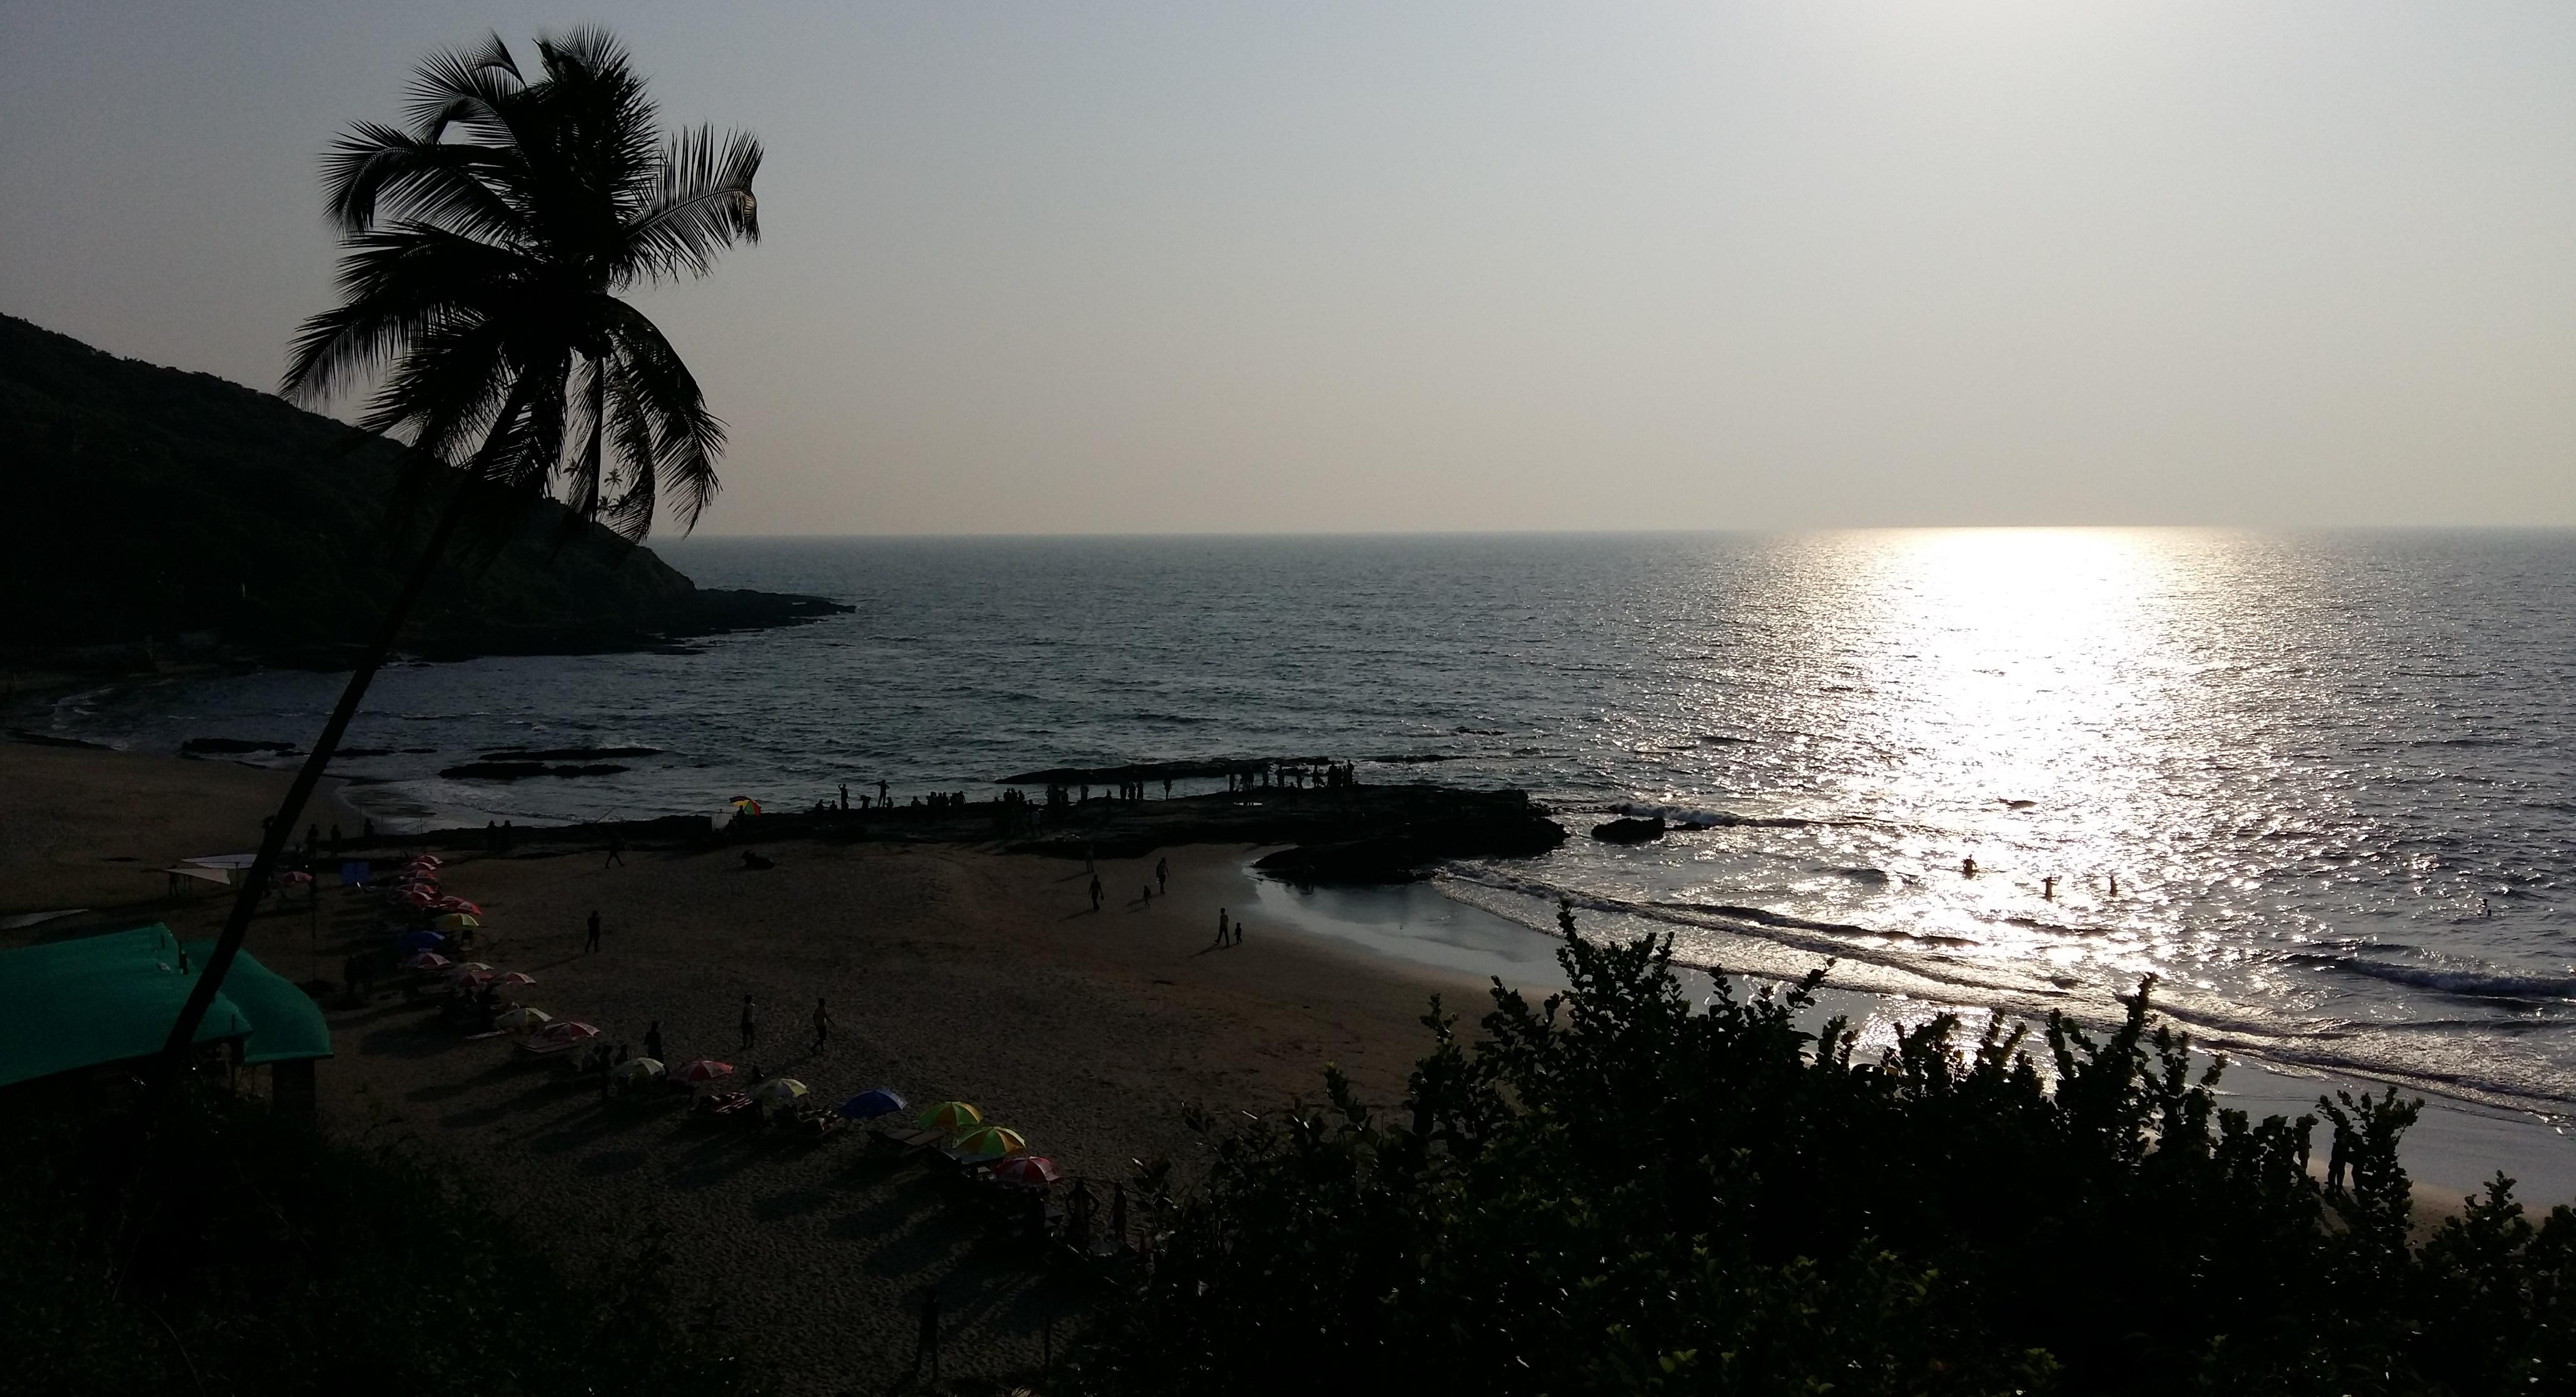 India Goa 印度果阿:海灘、度假村與觀光客之外(上)